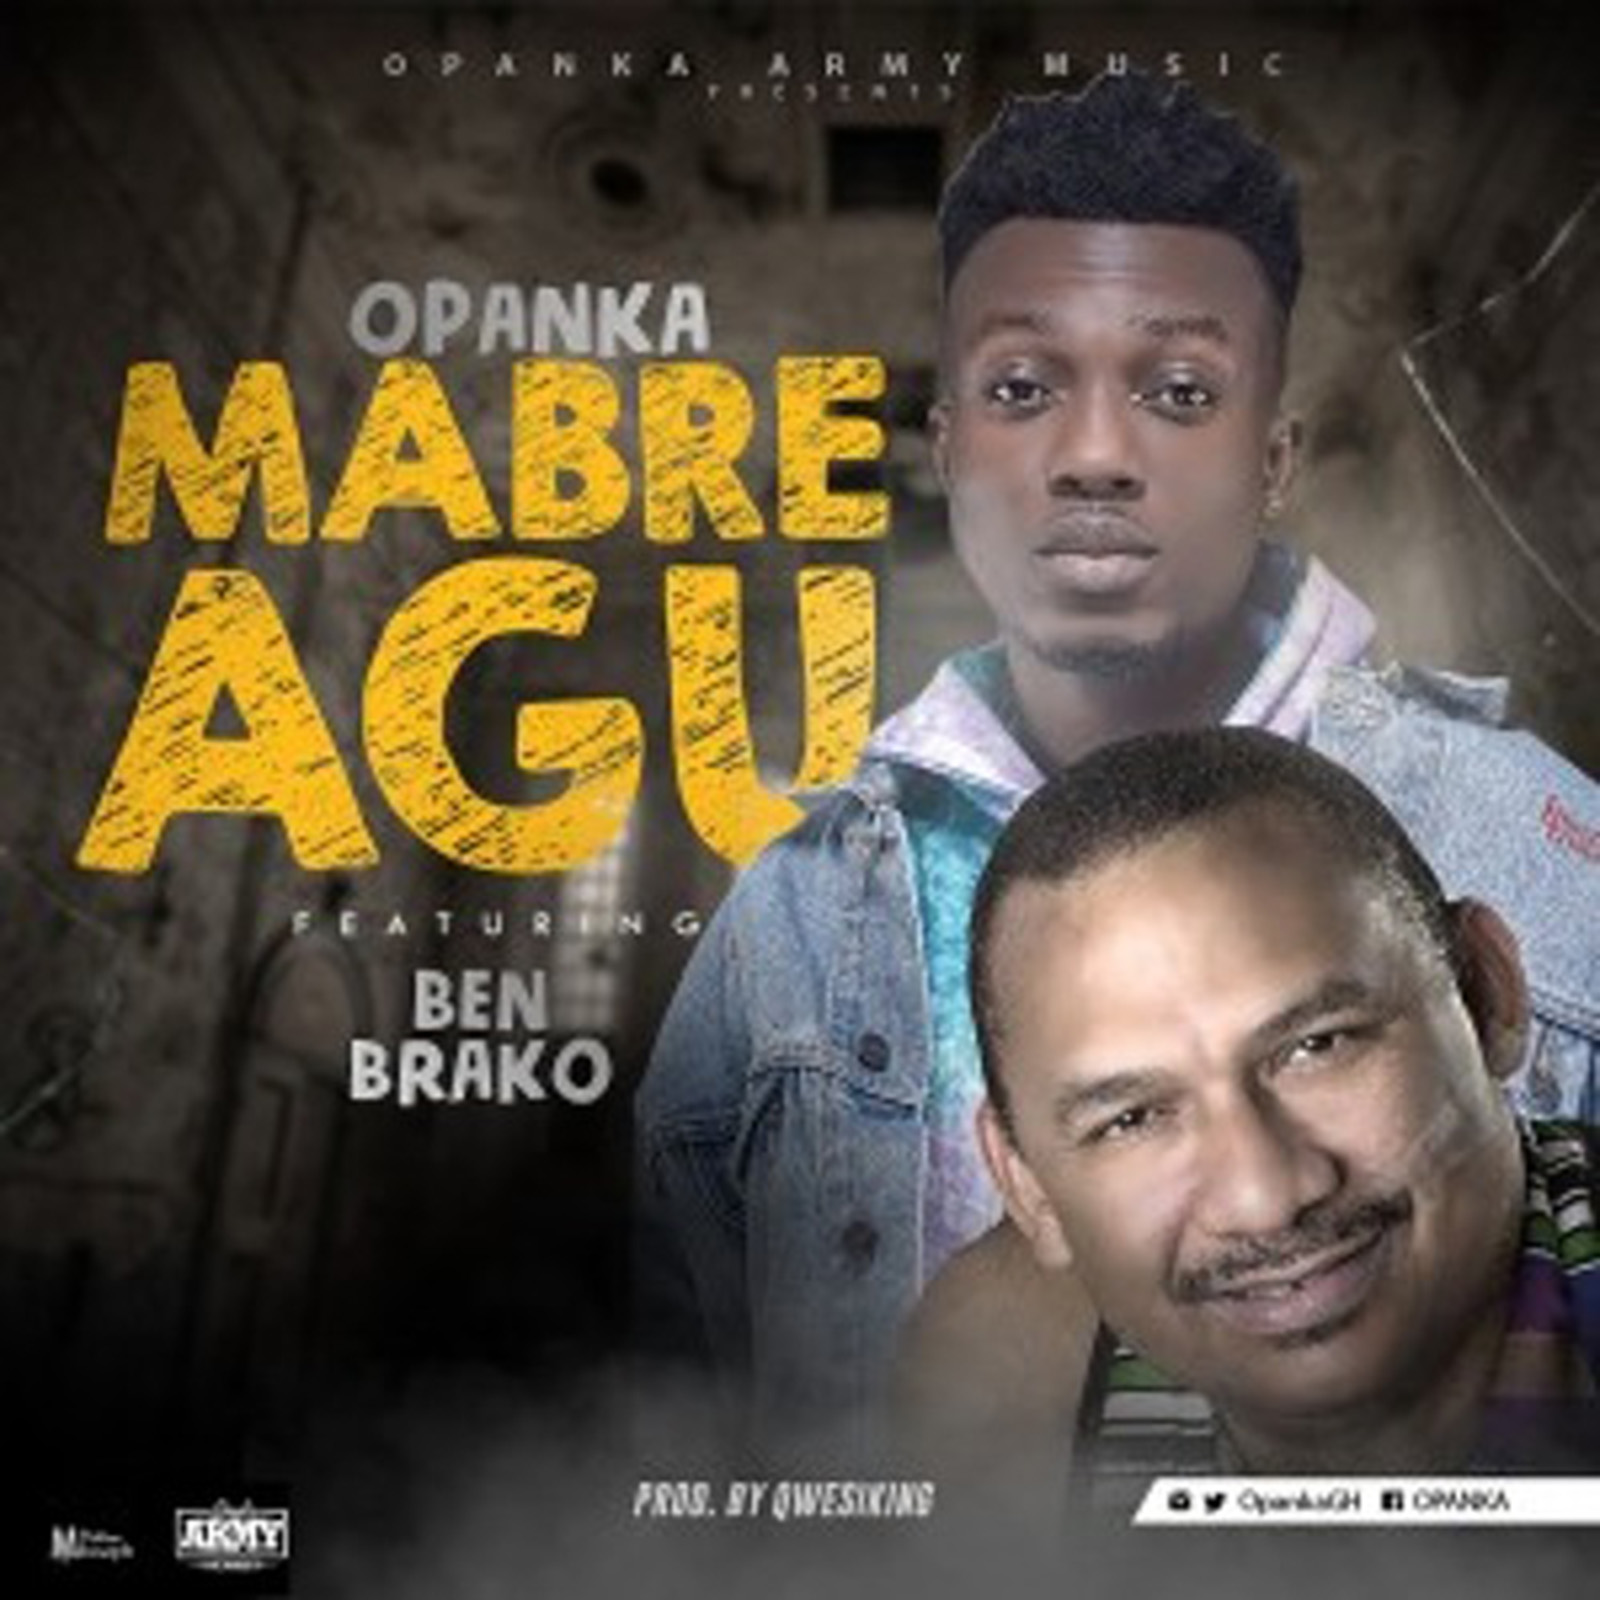 Mabre Agu by Opanka feat. Ben Brako